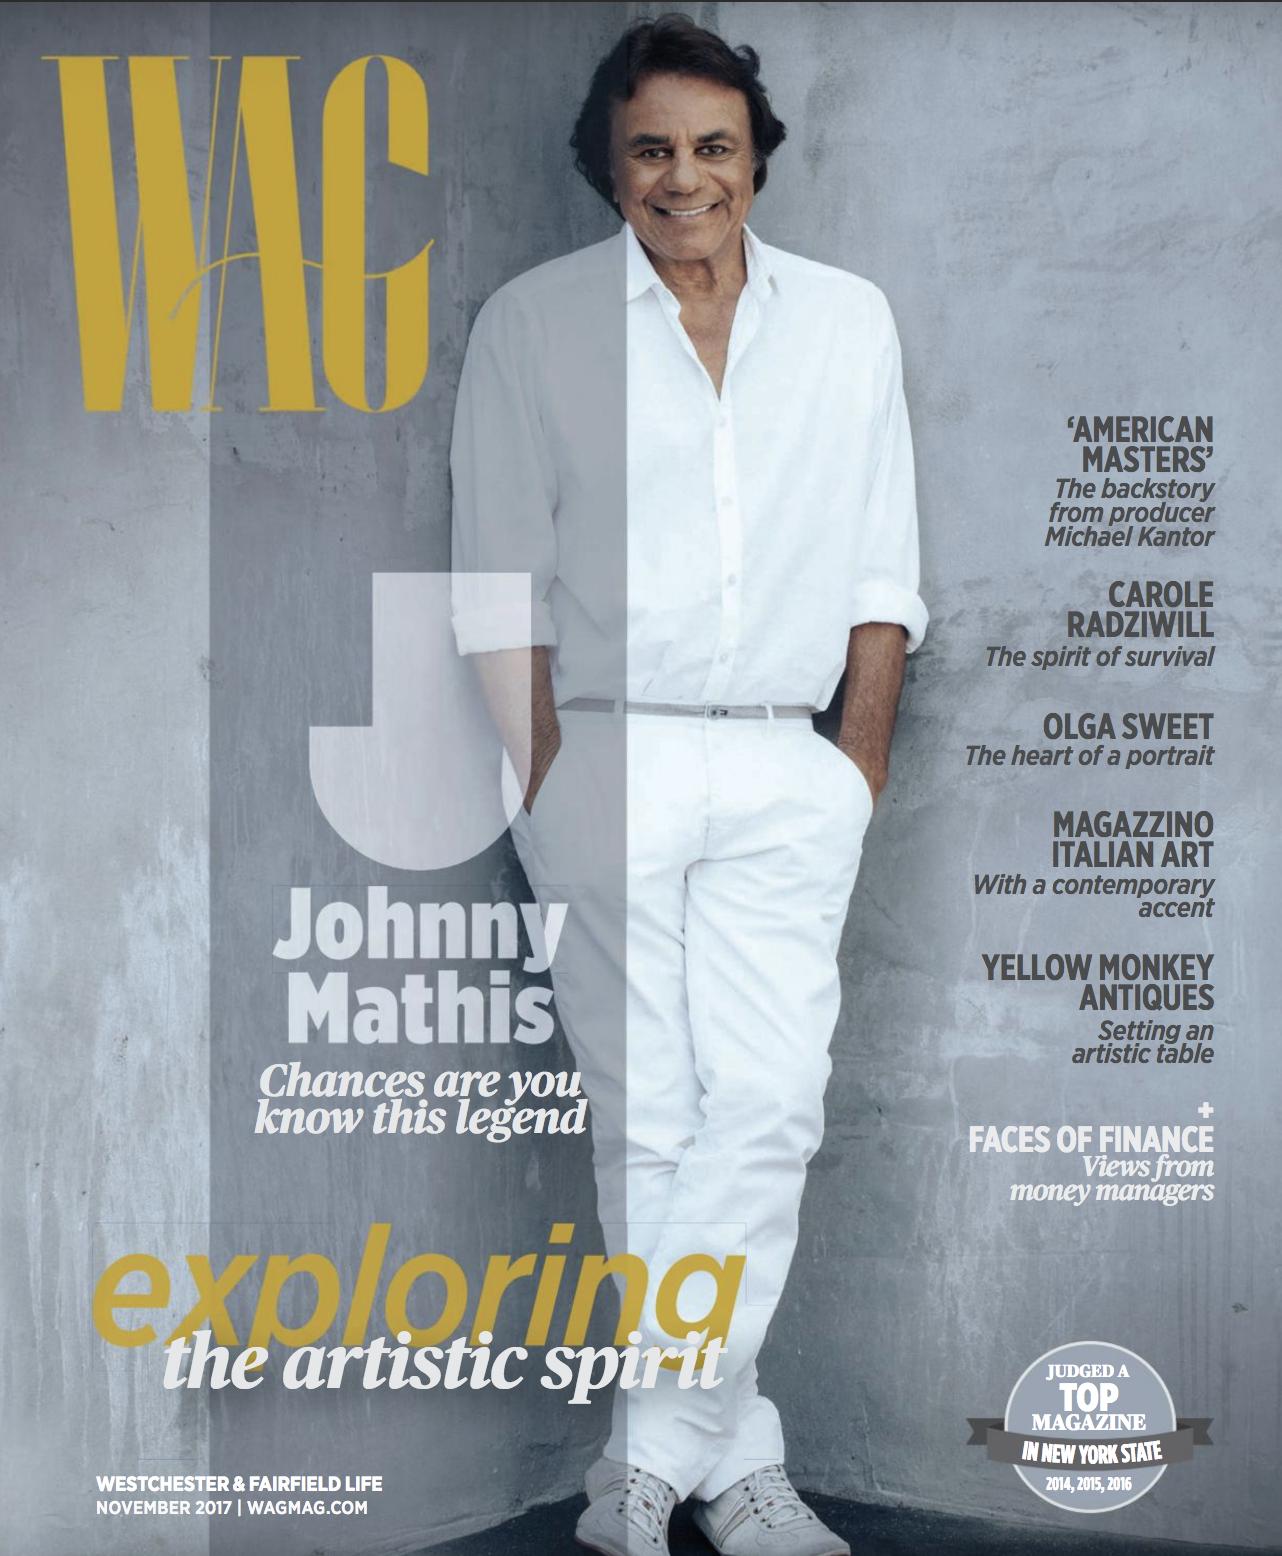 Cafe La Fondita - WAG Magazine - November 2017